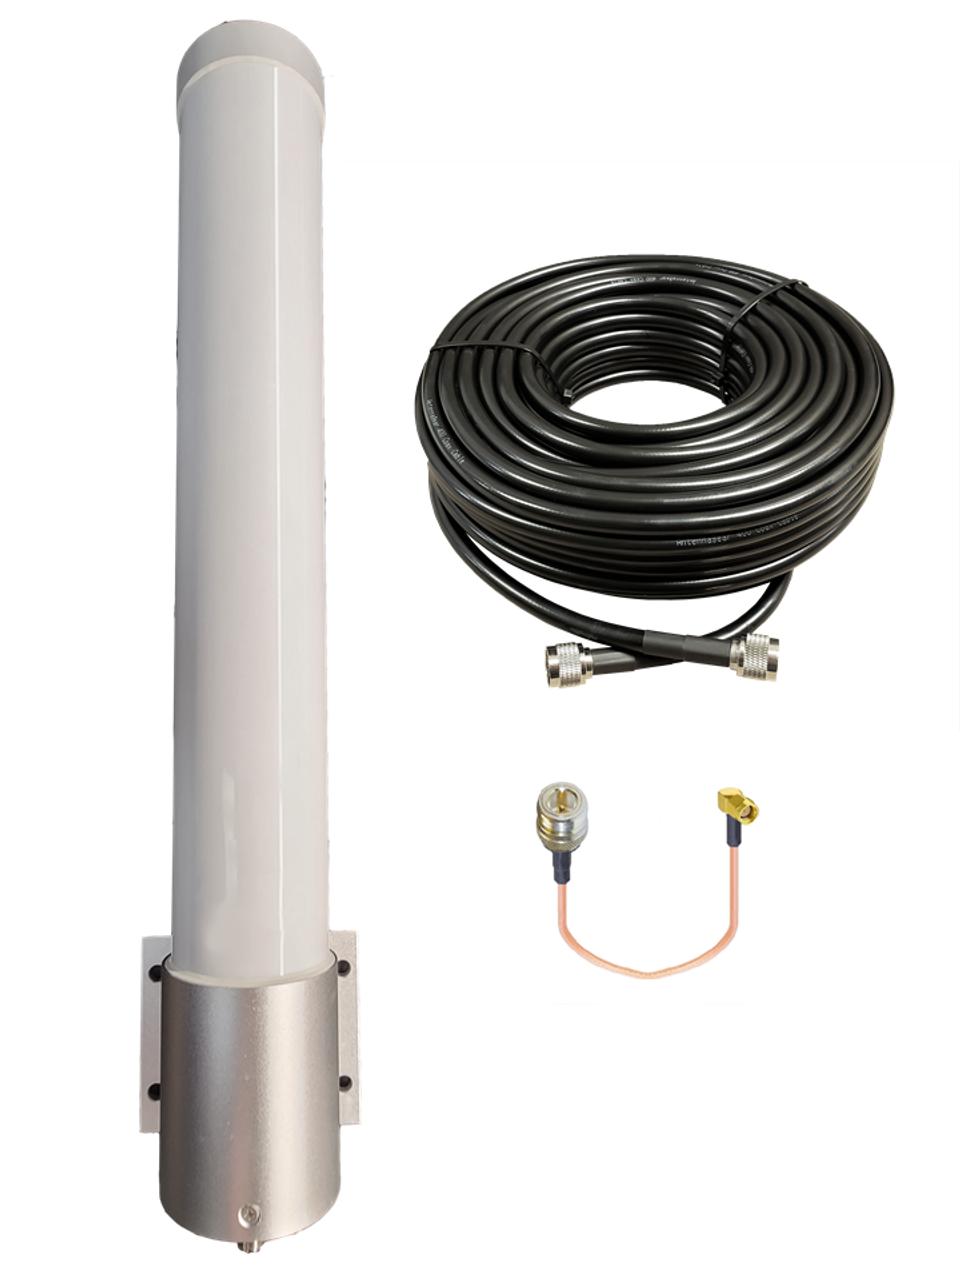 M25T T-Mobile Omni Directional Fiberglass Cellular 4G LTE 5G NR Band 71 External Data M2M IoT Antenna - NF - Kit